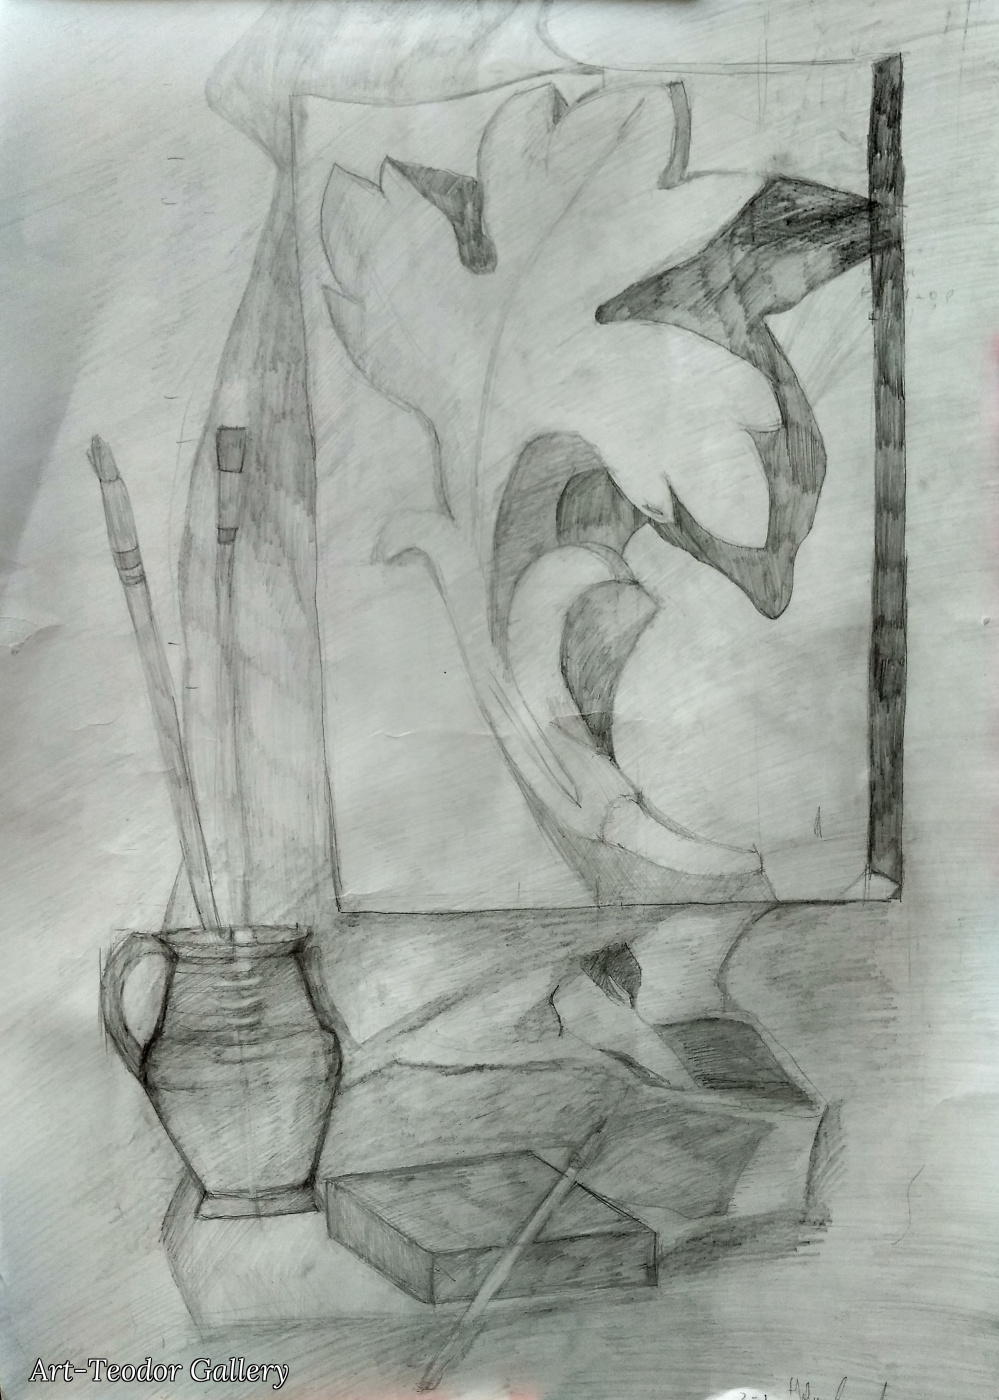 Art-Teodor Gallery. Творческий беспорядок